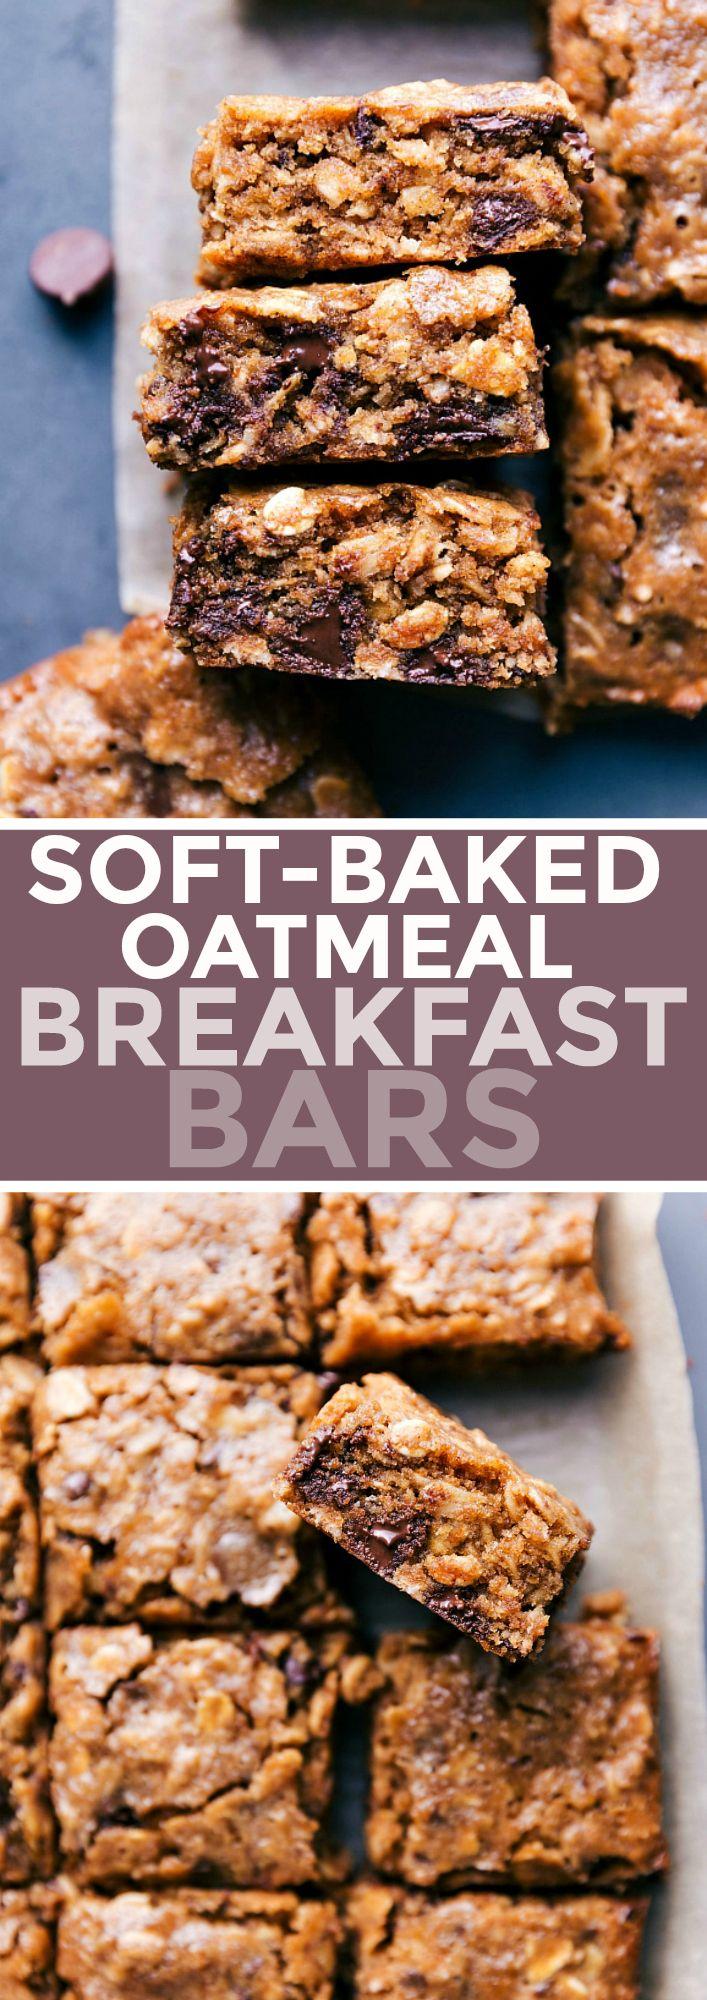 Soft-baked Oatmeal Breakfast Bars